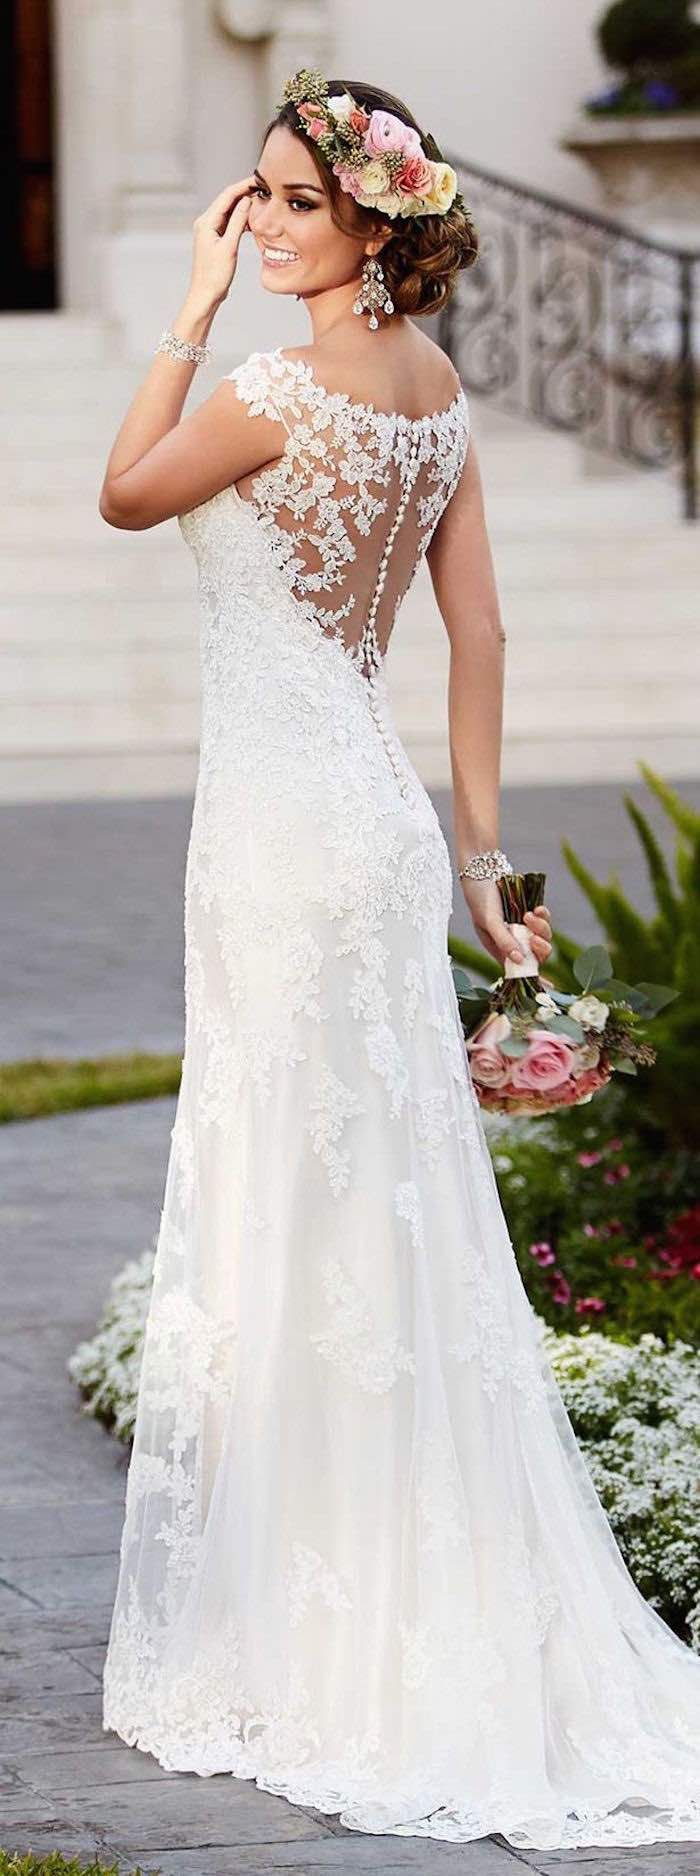 Wedding Dresses At 1000+ Ideas About Wedding Dresses On Pinterest  Weddings, Bridal